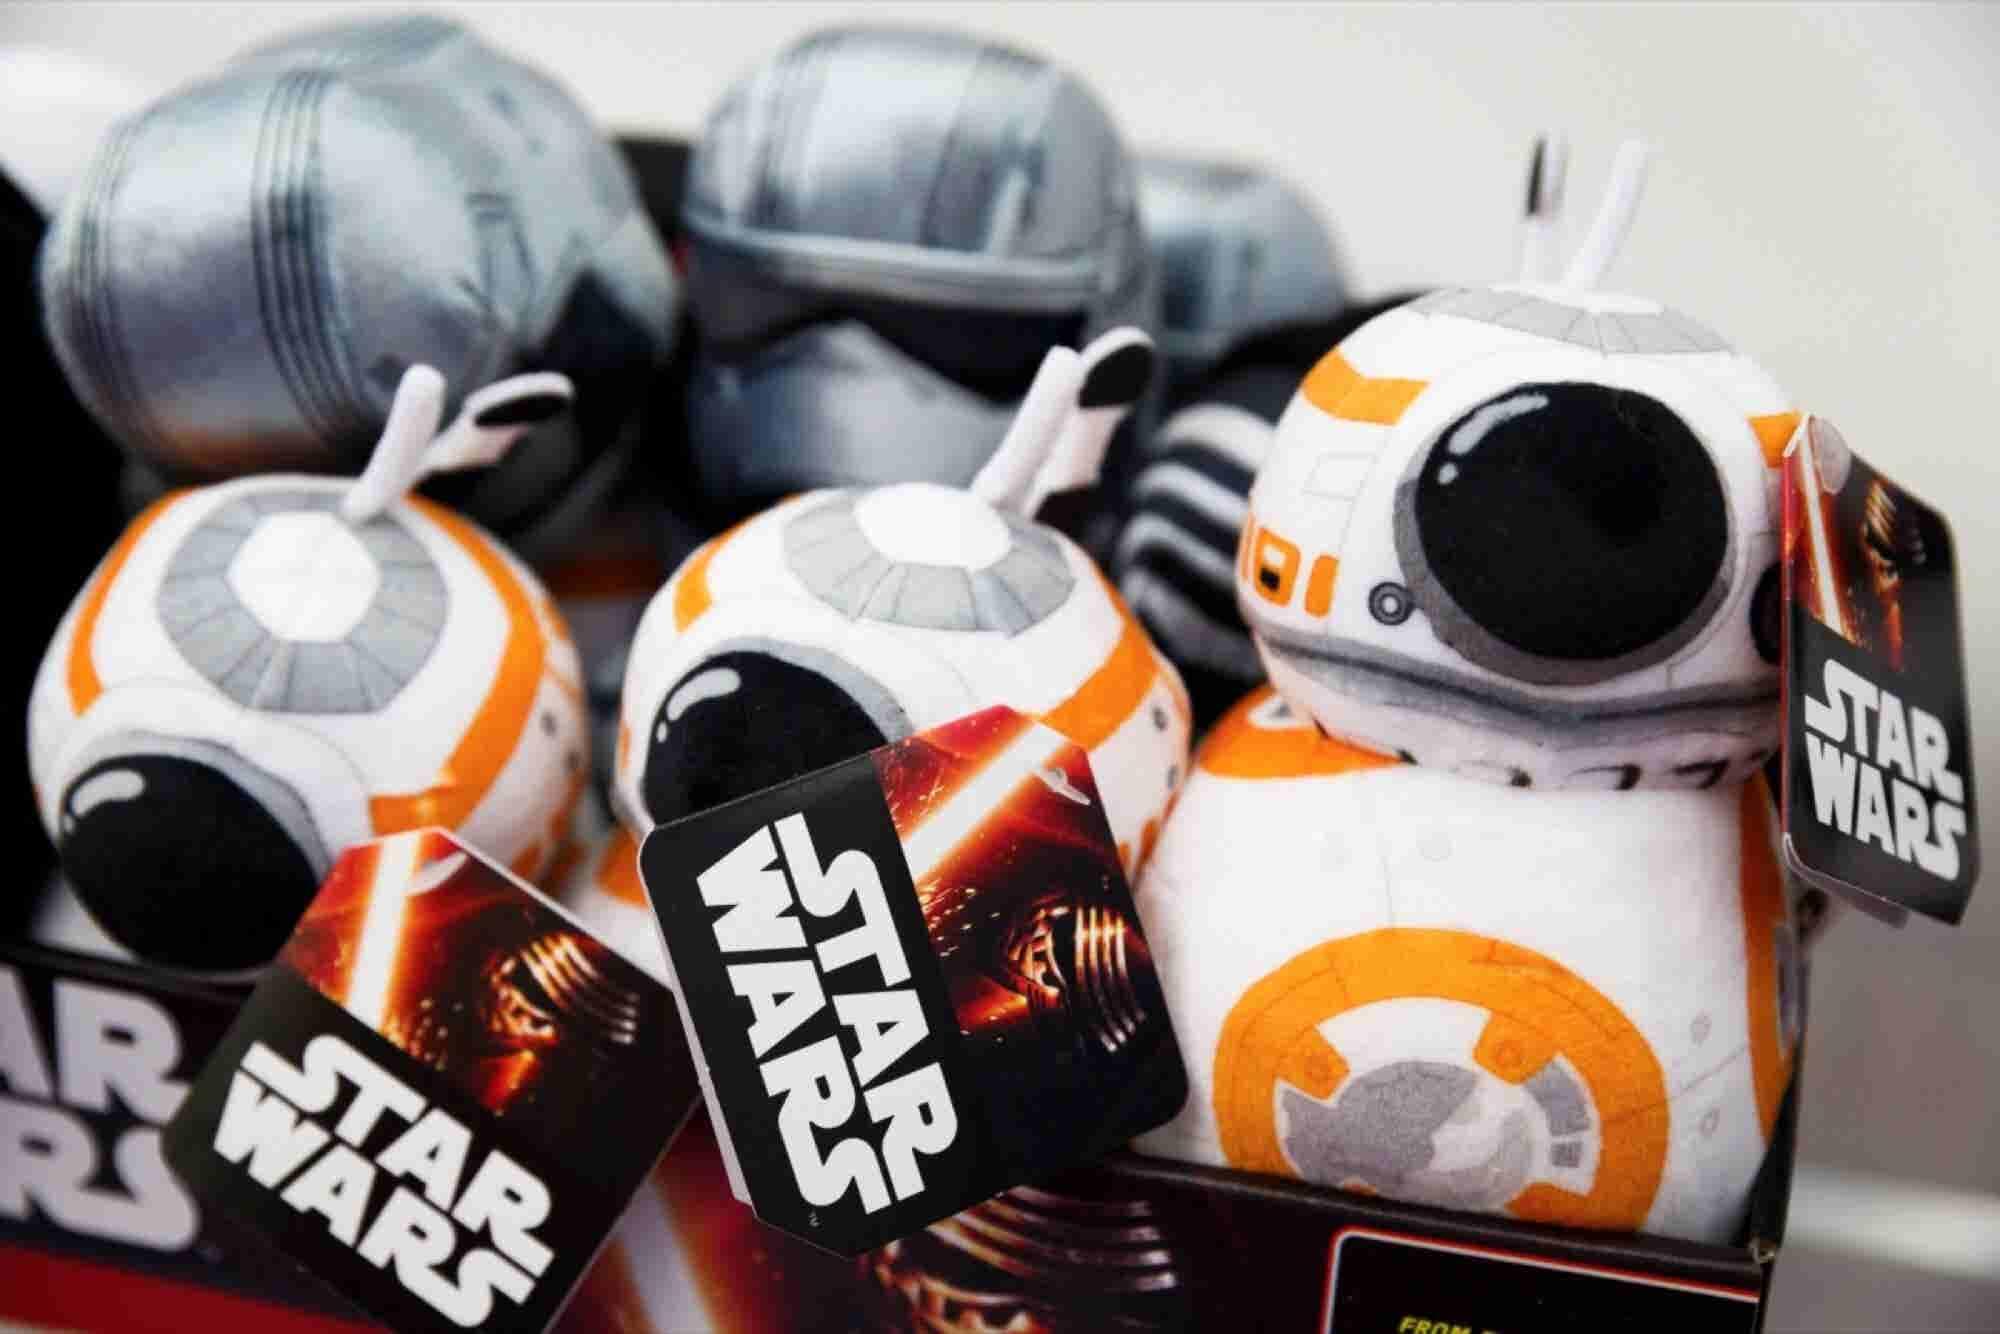 Let's Talk About 'Star Wars' -- That Franchising Juggernaut